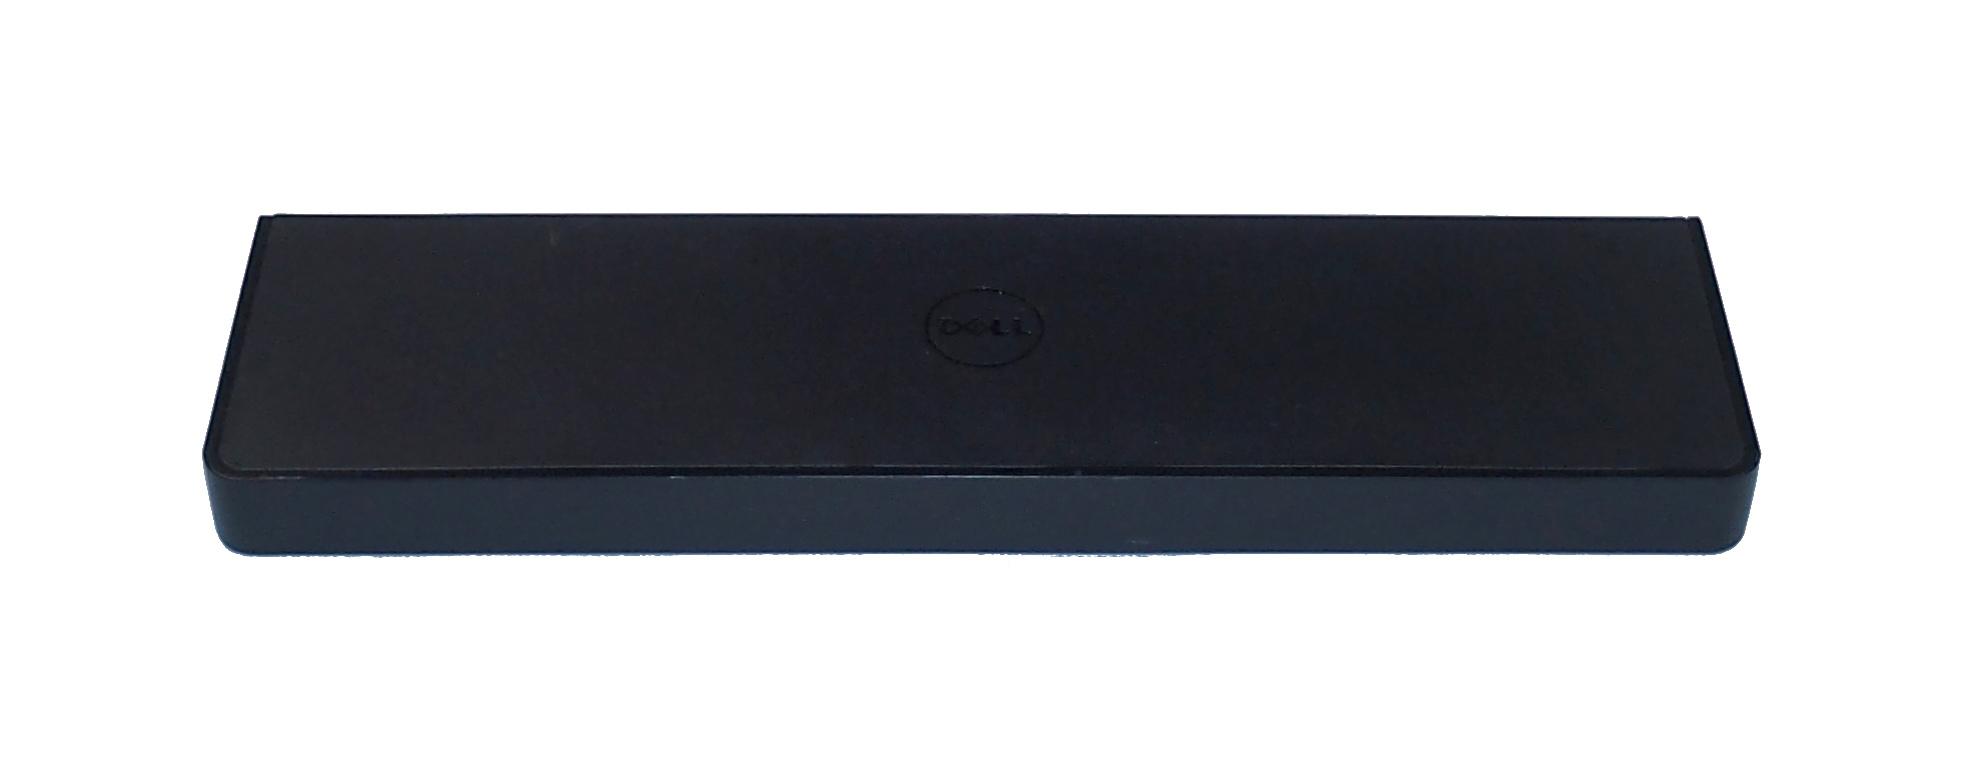 Dell Y32XH Model: D3000 USB3.0 Laptop Docking Station